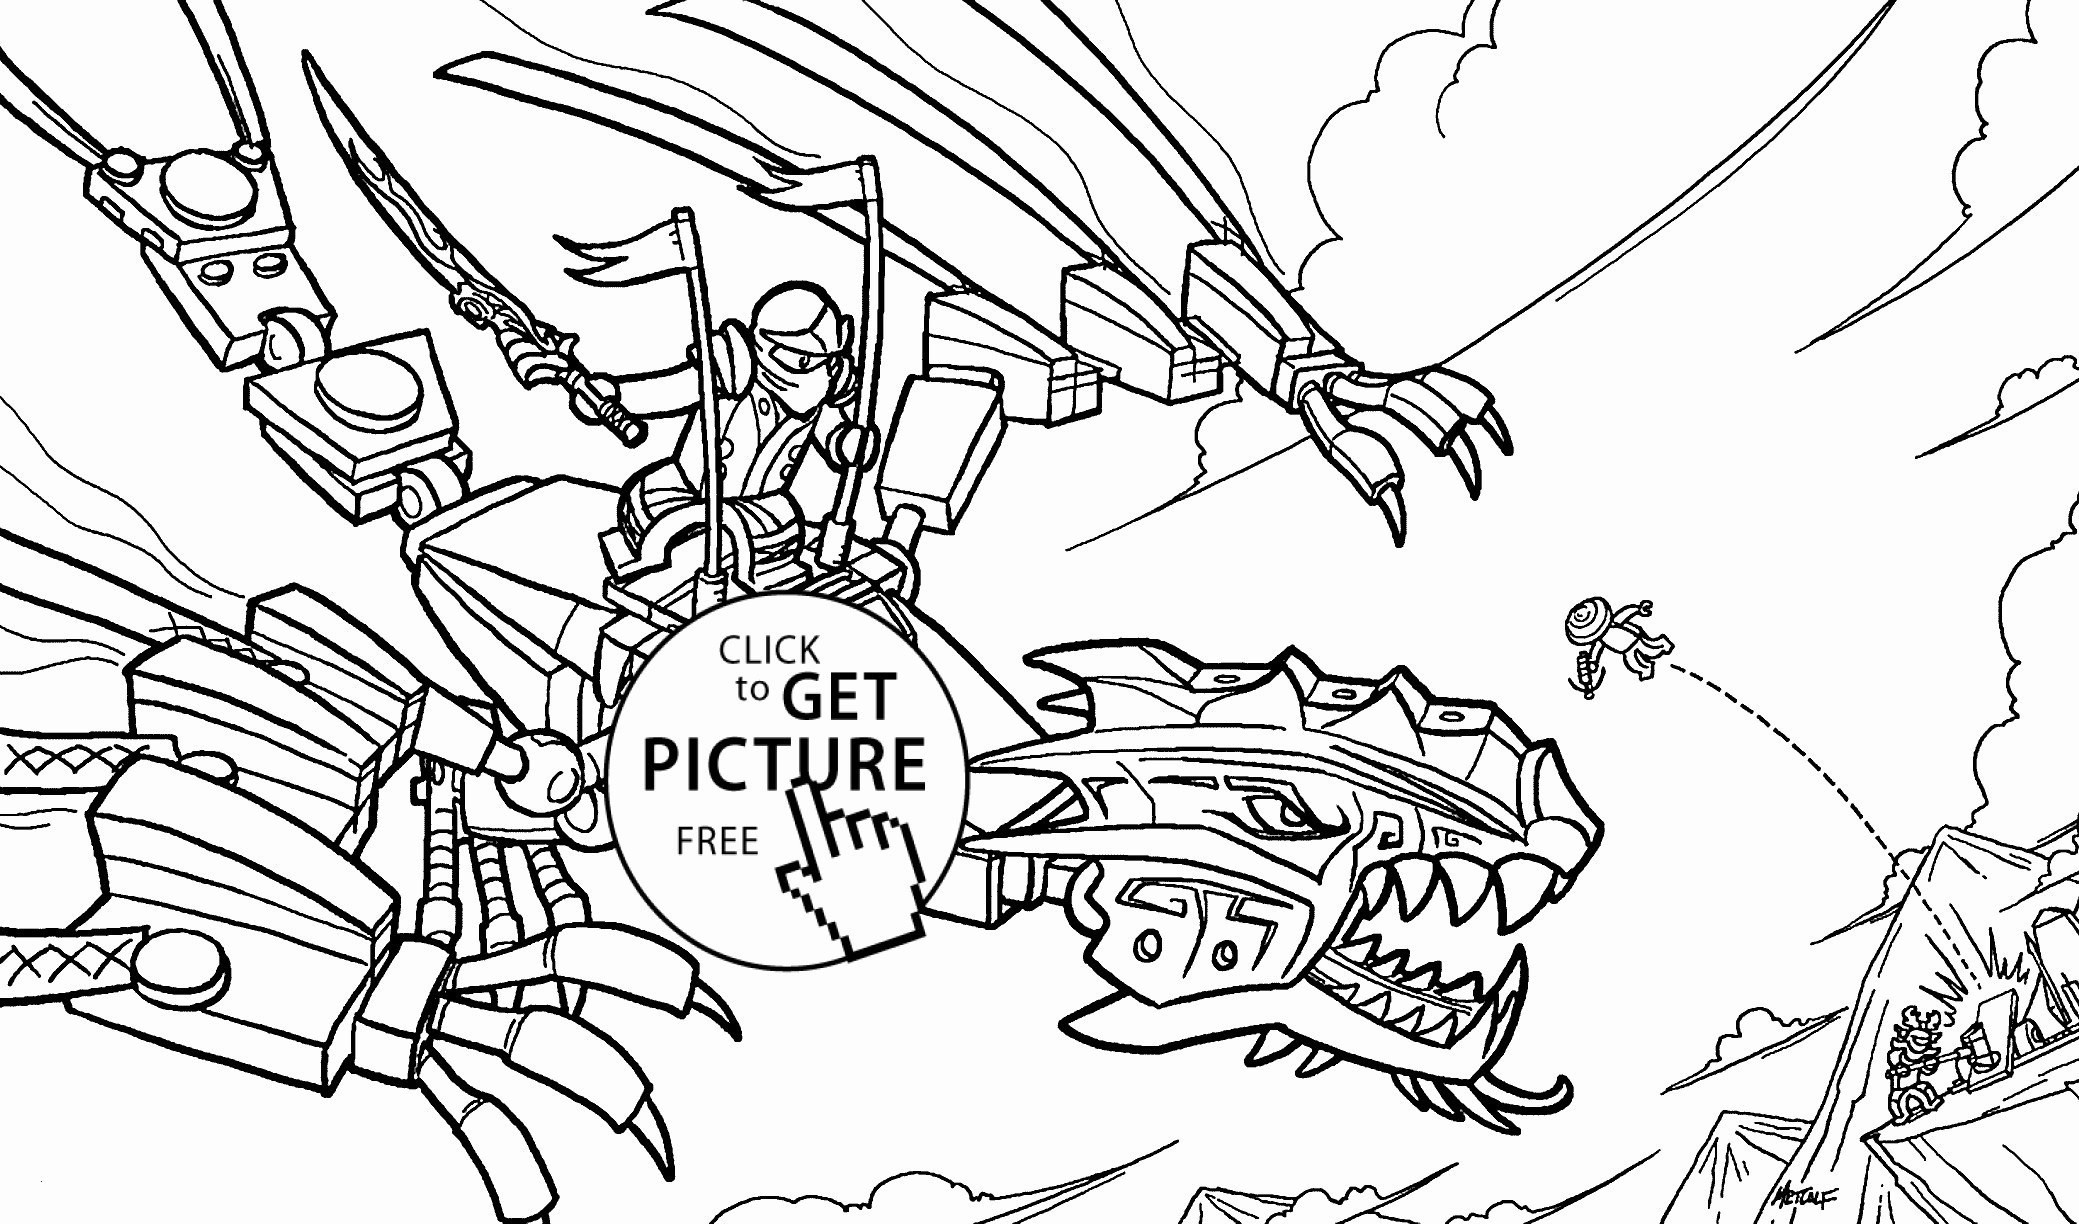 Ausmalbild Ninjago Lloyd Einzigartig 37 Ninjago Geister Ausmalbilder Scoredatscore Inspirierend Bilder